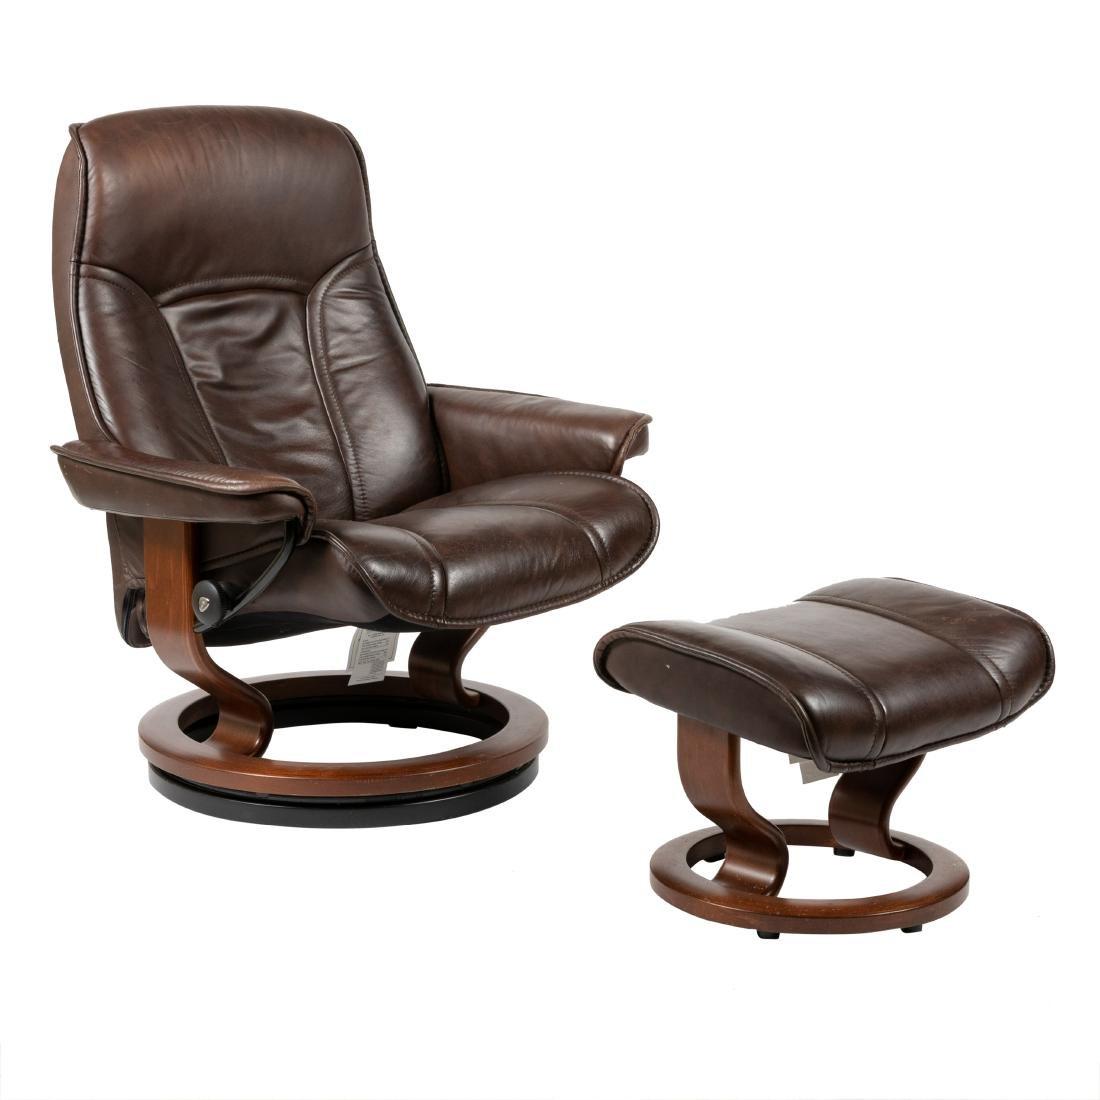 Ekornes - Stressless - Chair & Ottoman